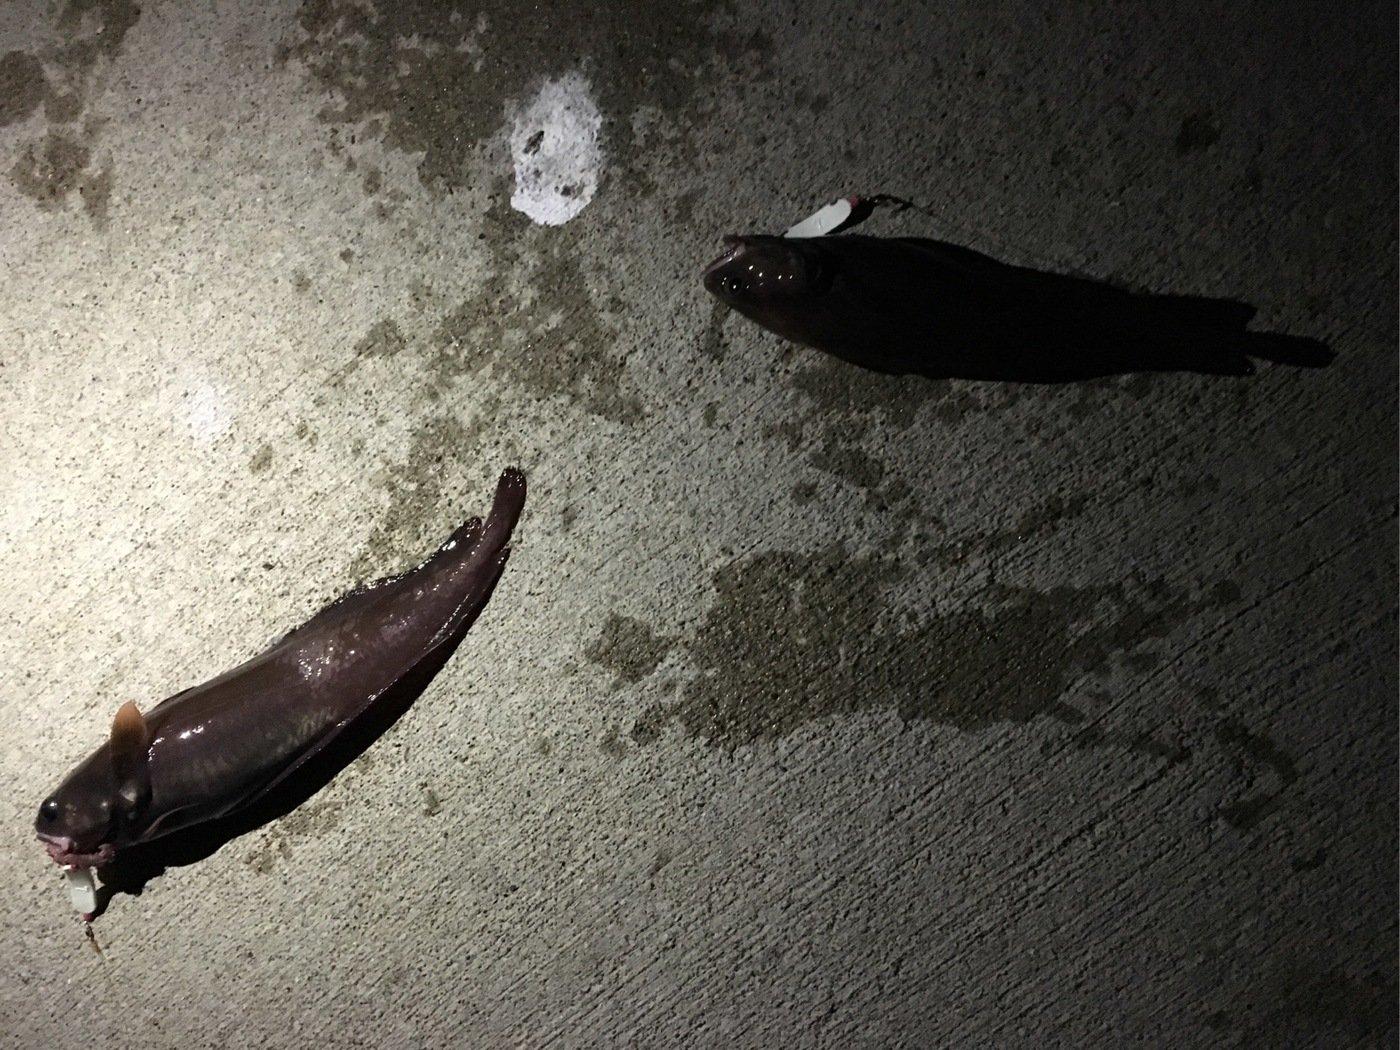 0138STYLEさんの投稿画像,写っている魚はエゾイソアイナメ